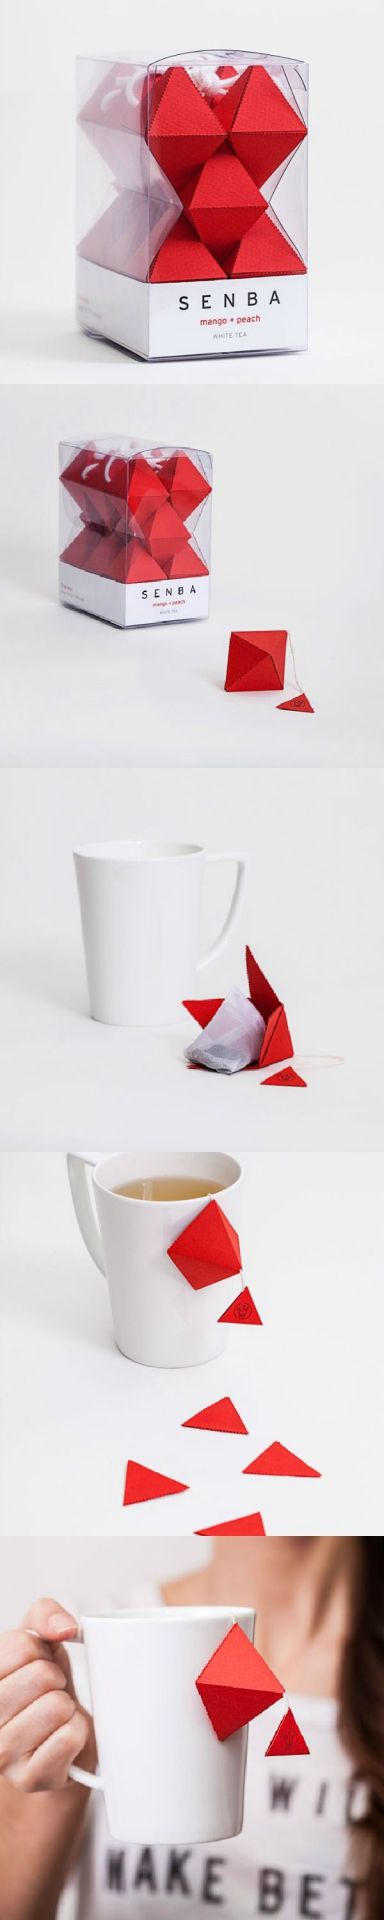 Senba tea design by Seita Goto.